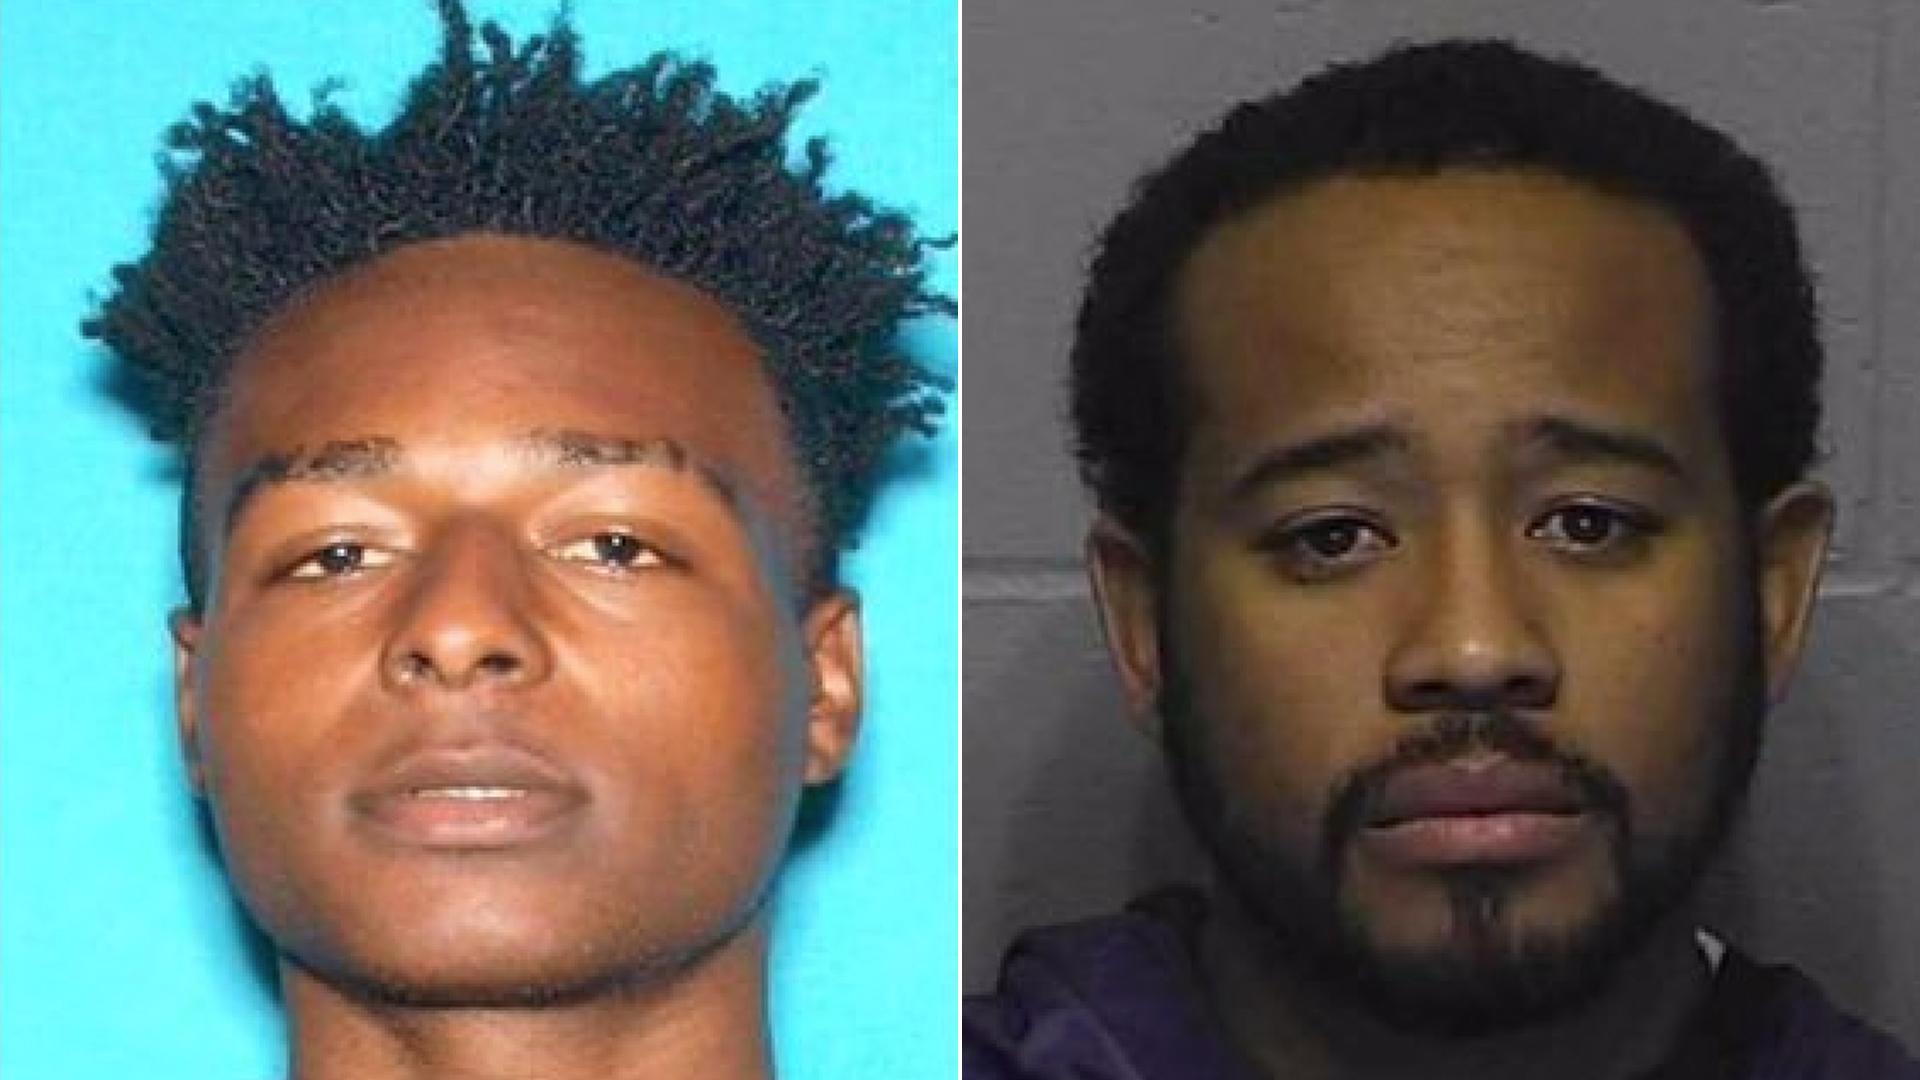 Homicide victim Adrian Dewayne Johnson, 23, of Inglewood, left, and homicide suspect Lancelot Joshua Wilburn, 38, of Bellflower, pictured in photos released by the Inglewood Police Department on Dec. 6, 2019.